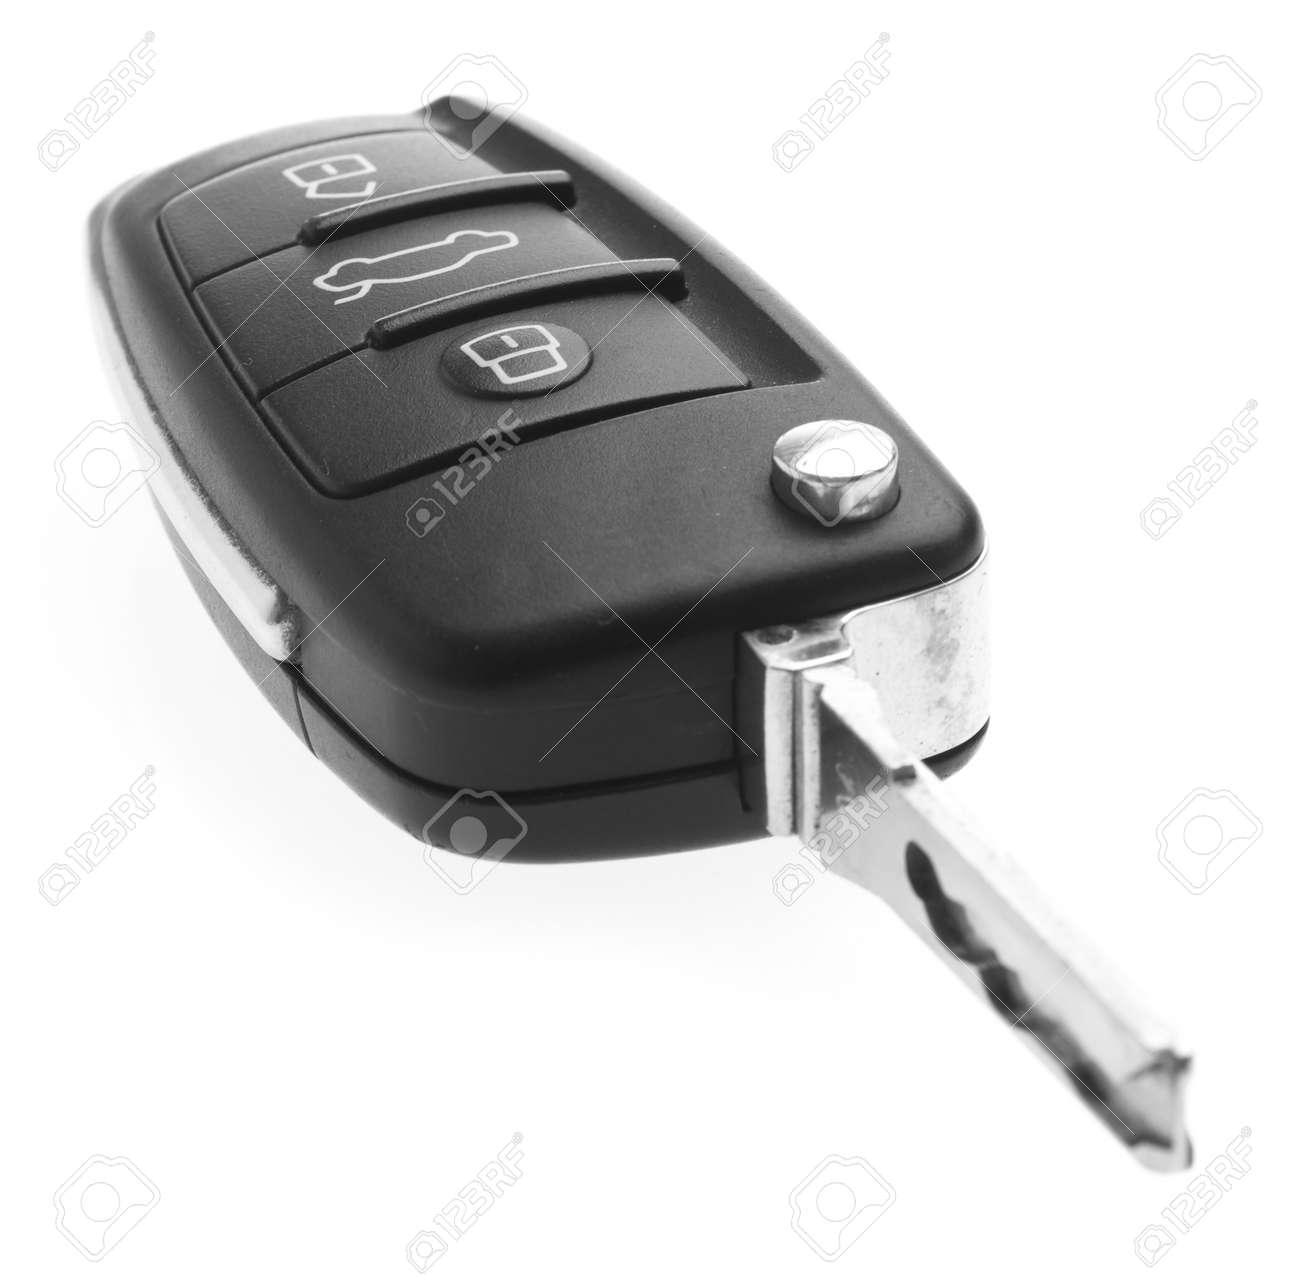 electronic car key isolated on a white background Stock Photo - 8706488